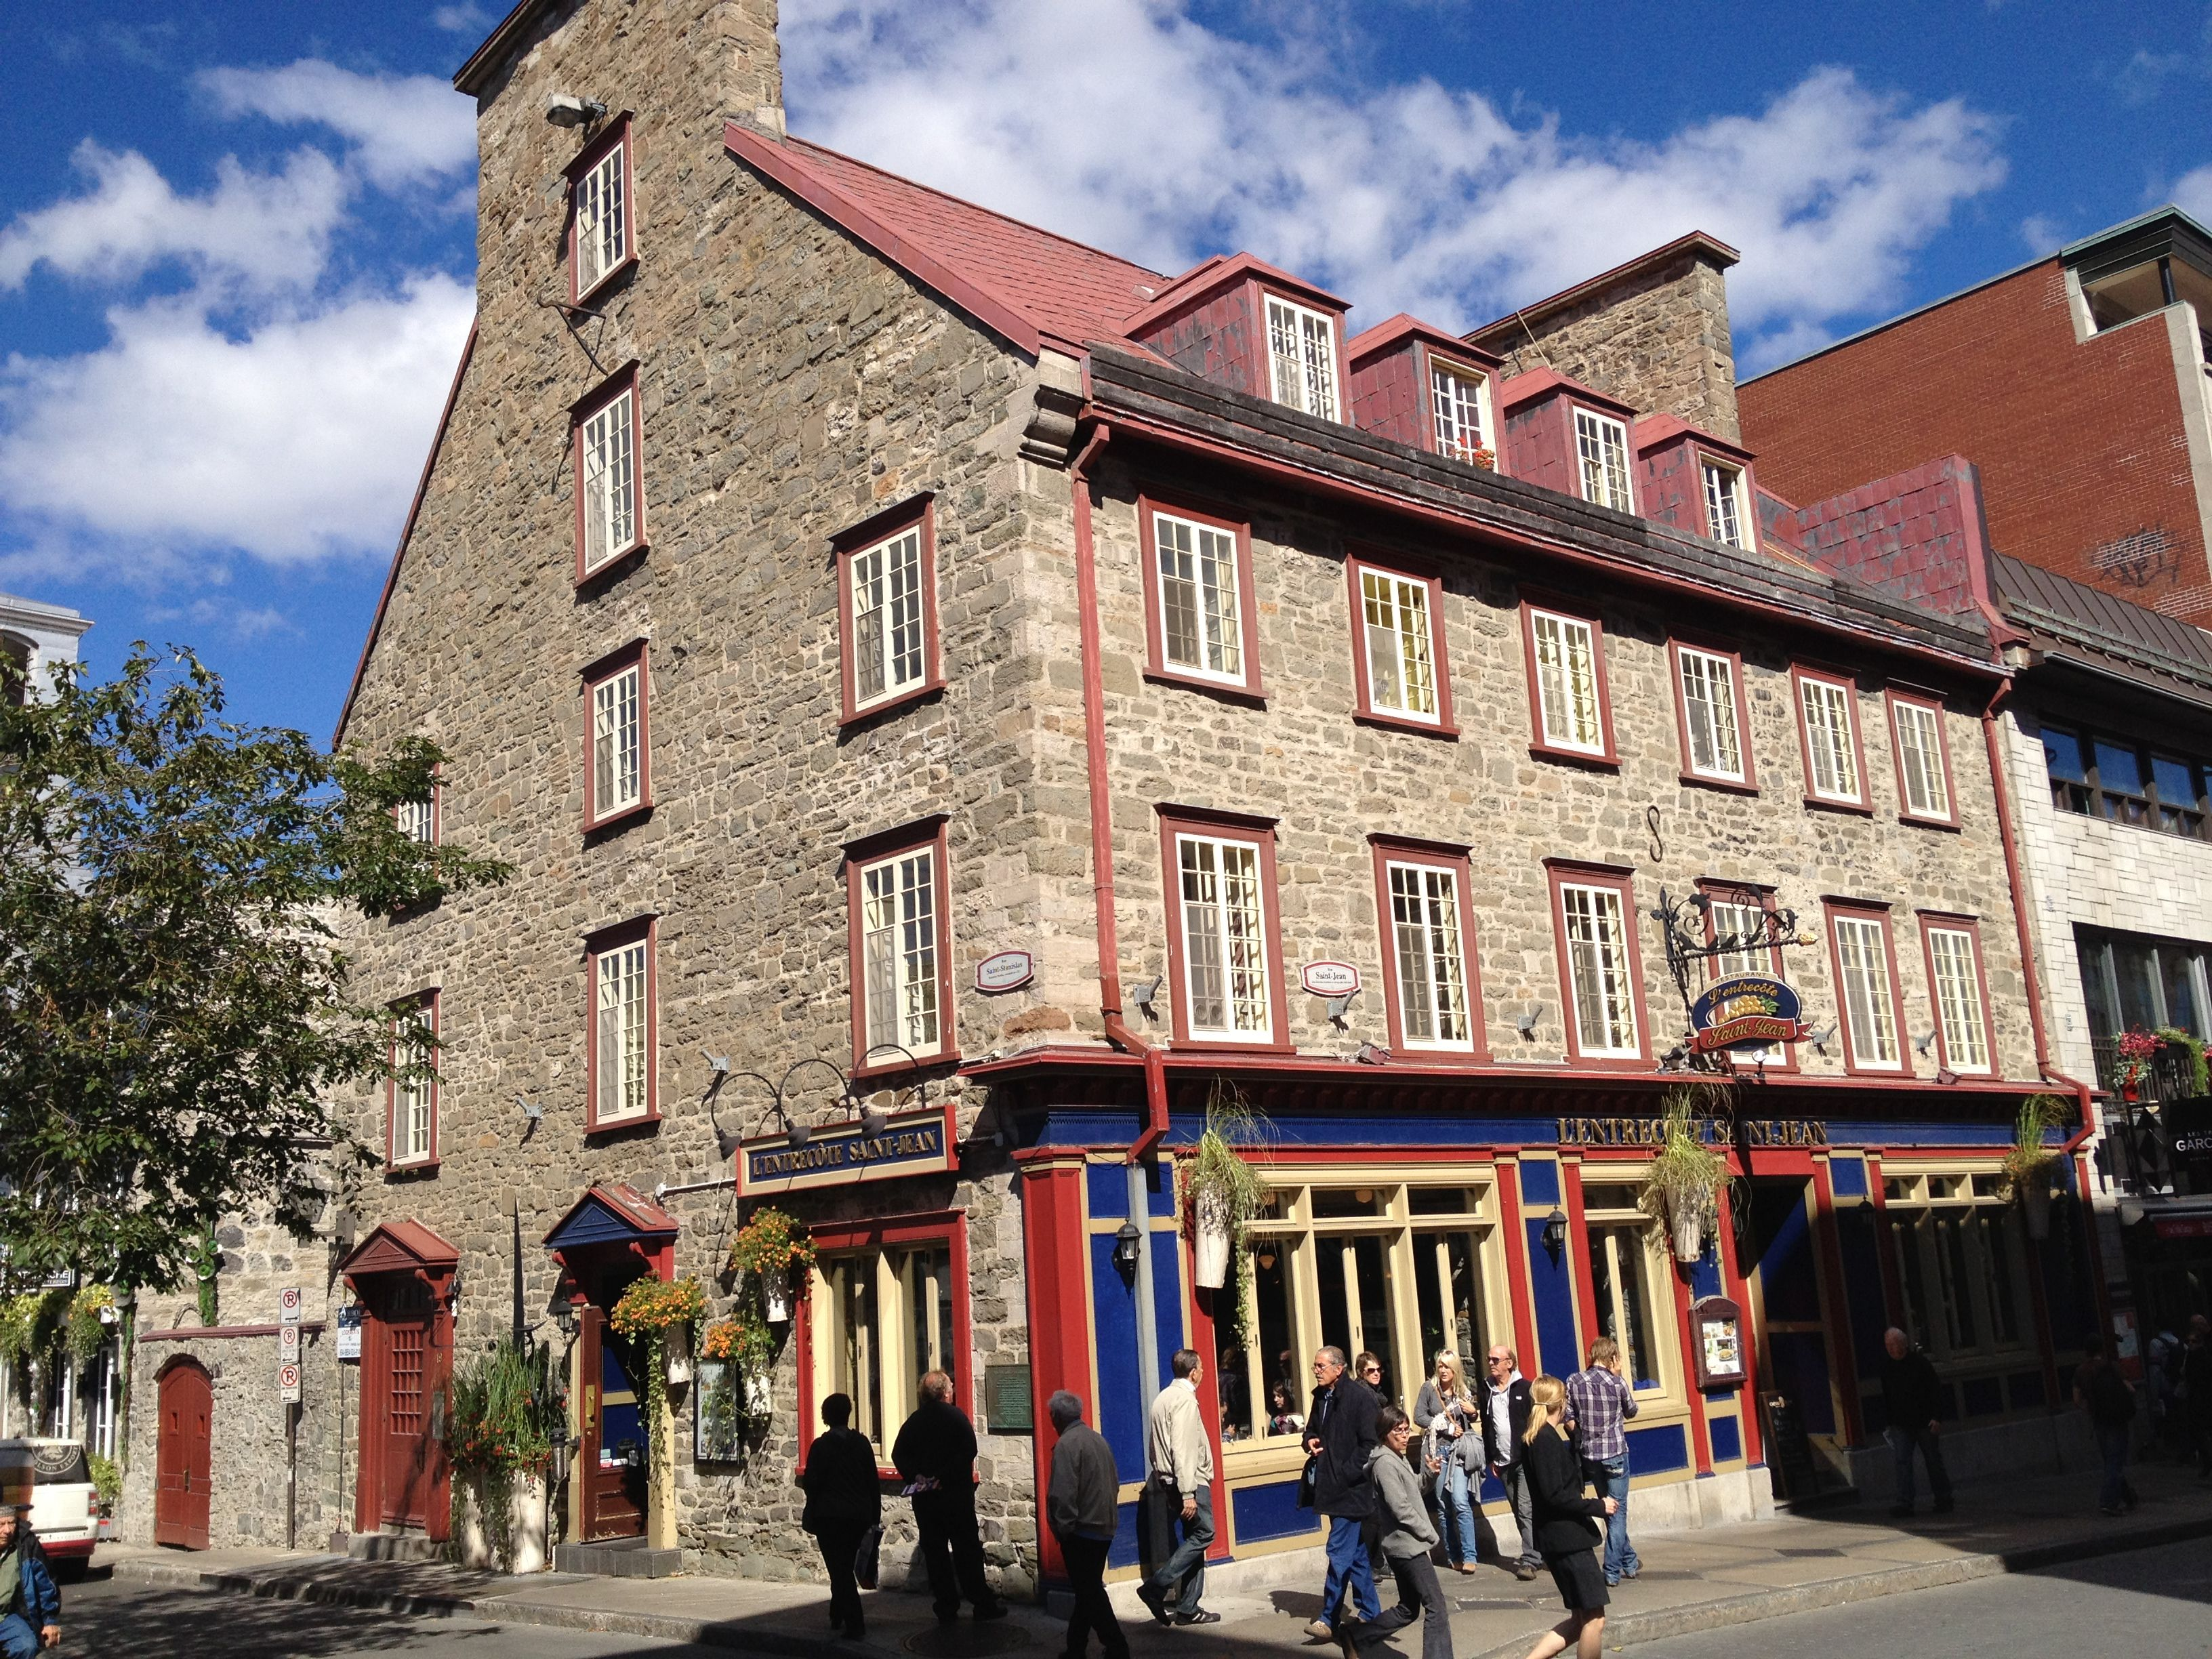 Quebec city canada architecture pinterest for Architecture quebec